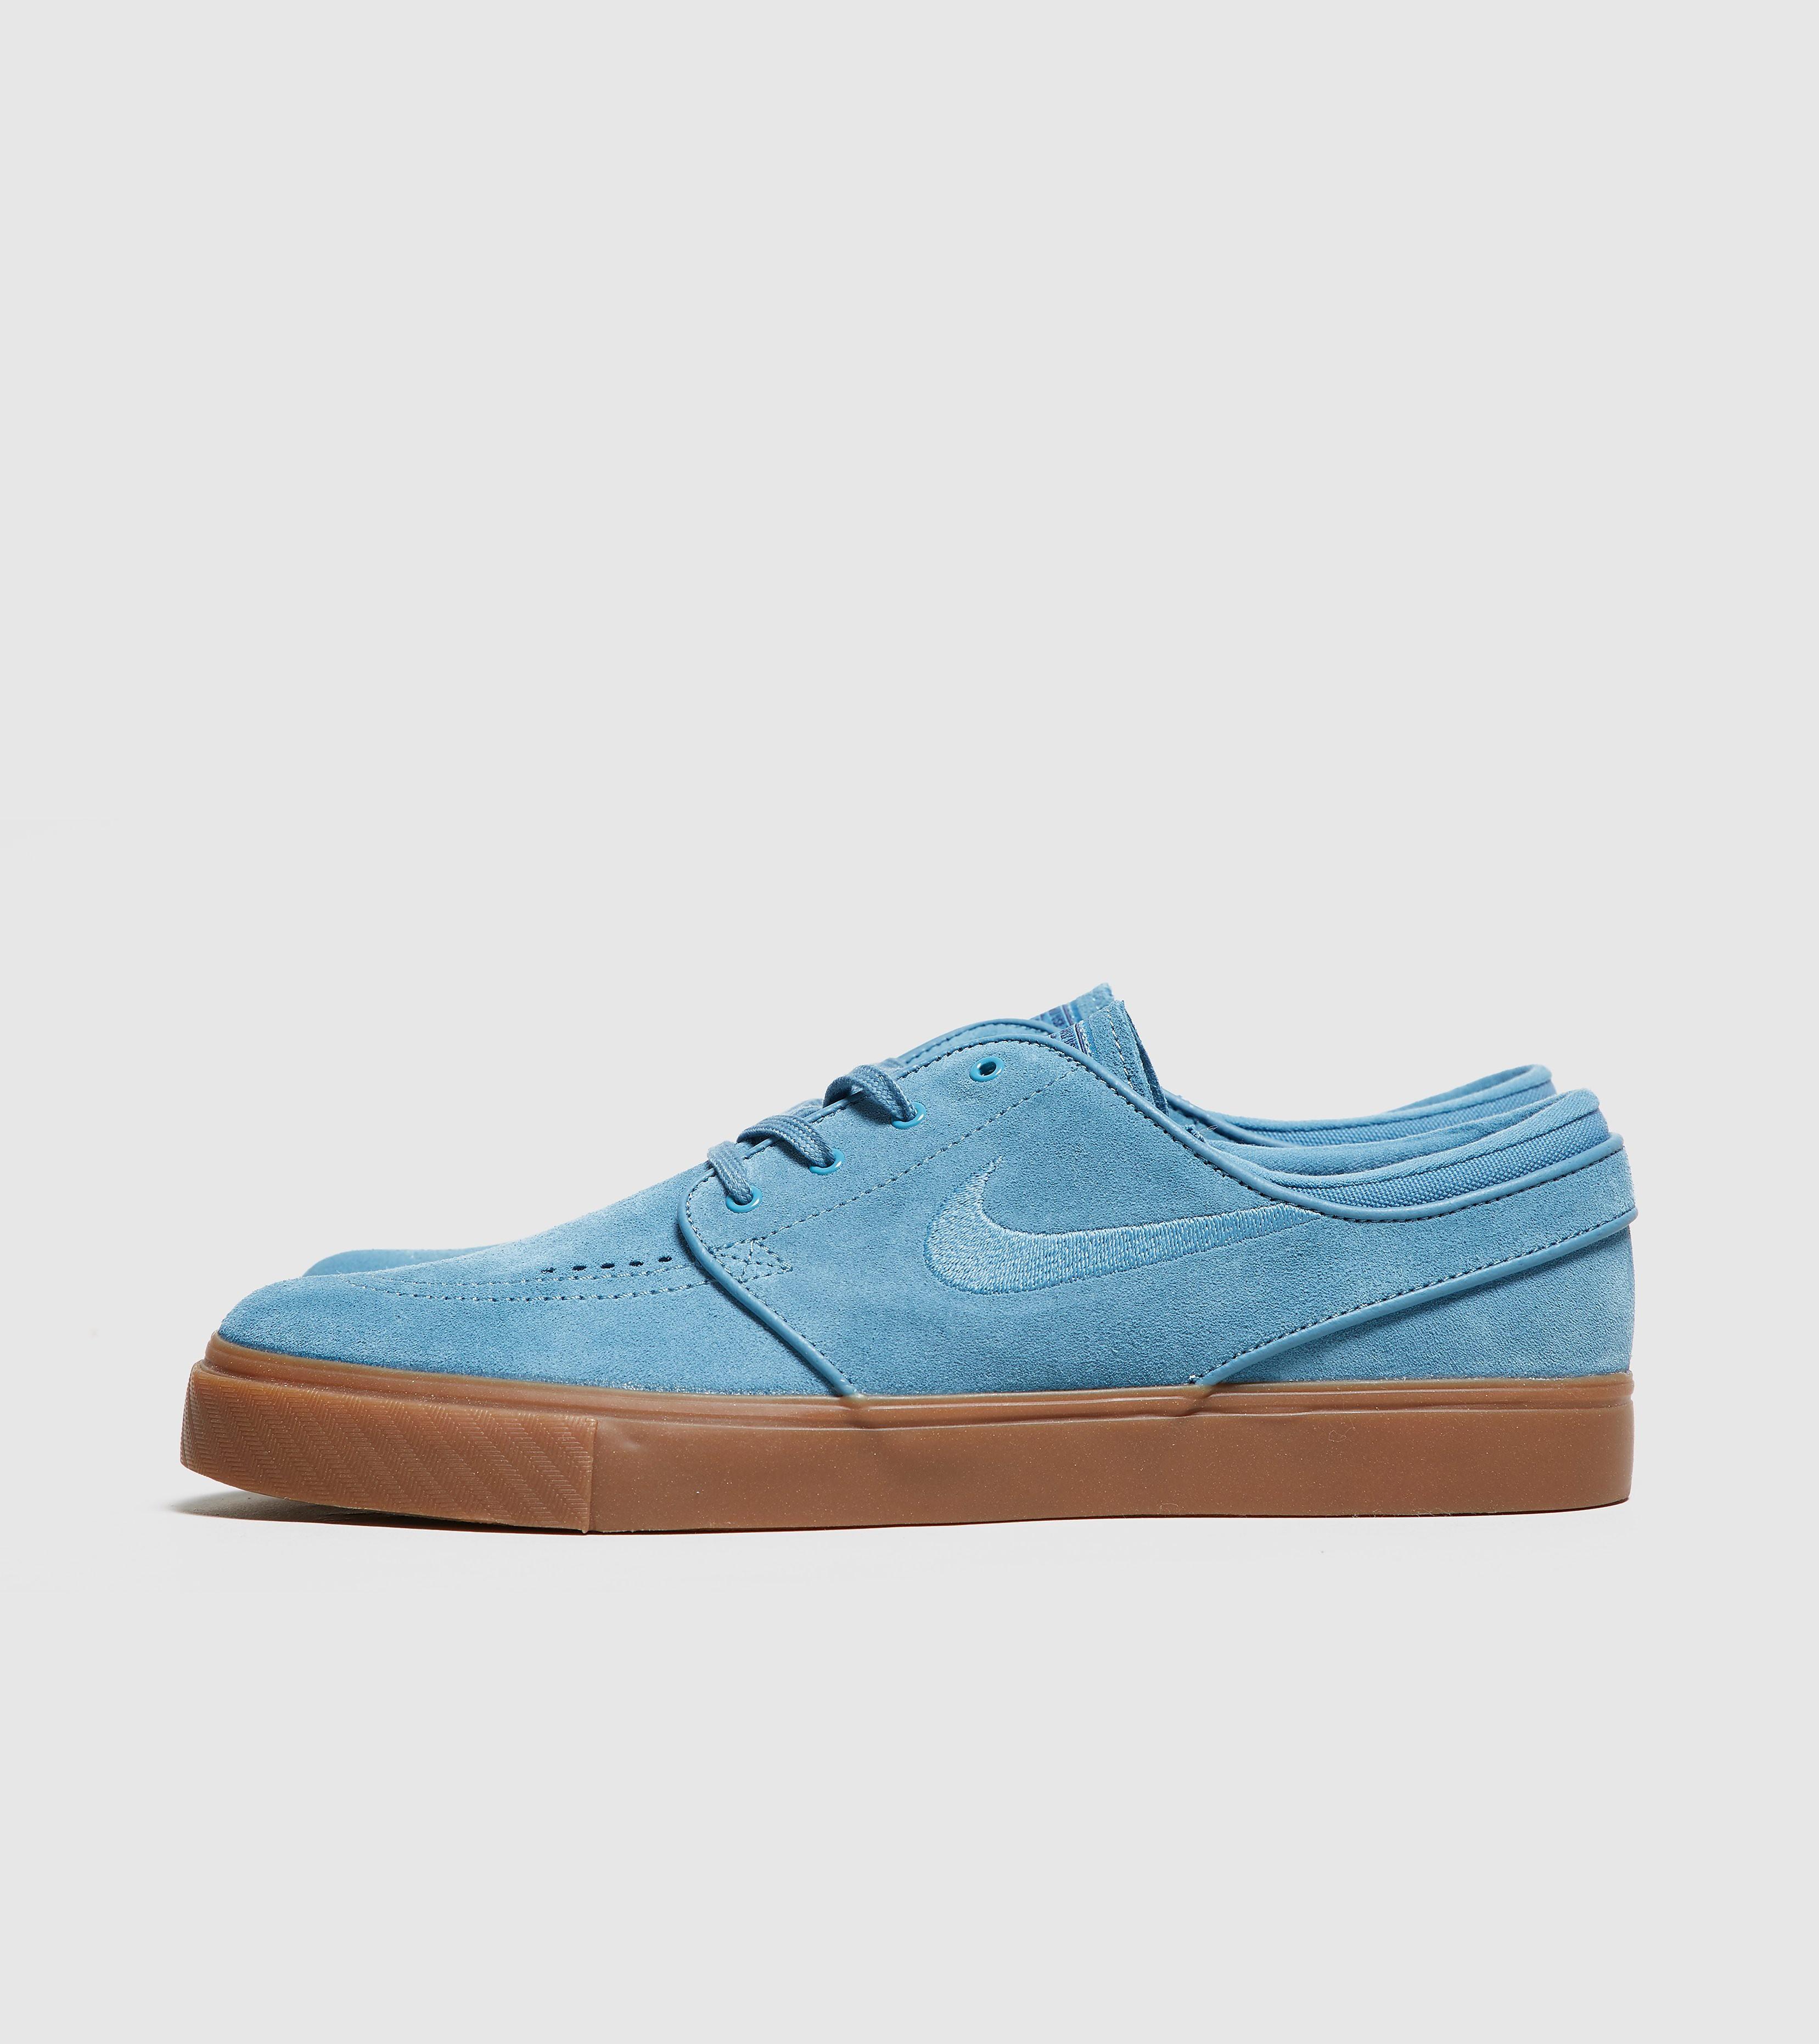 Nike SB Zoom Stefan Janoski, azul/marrón